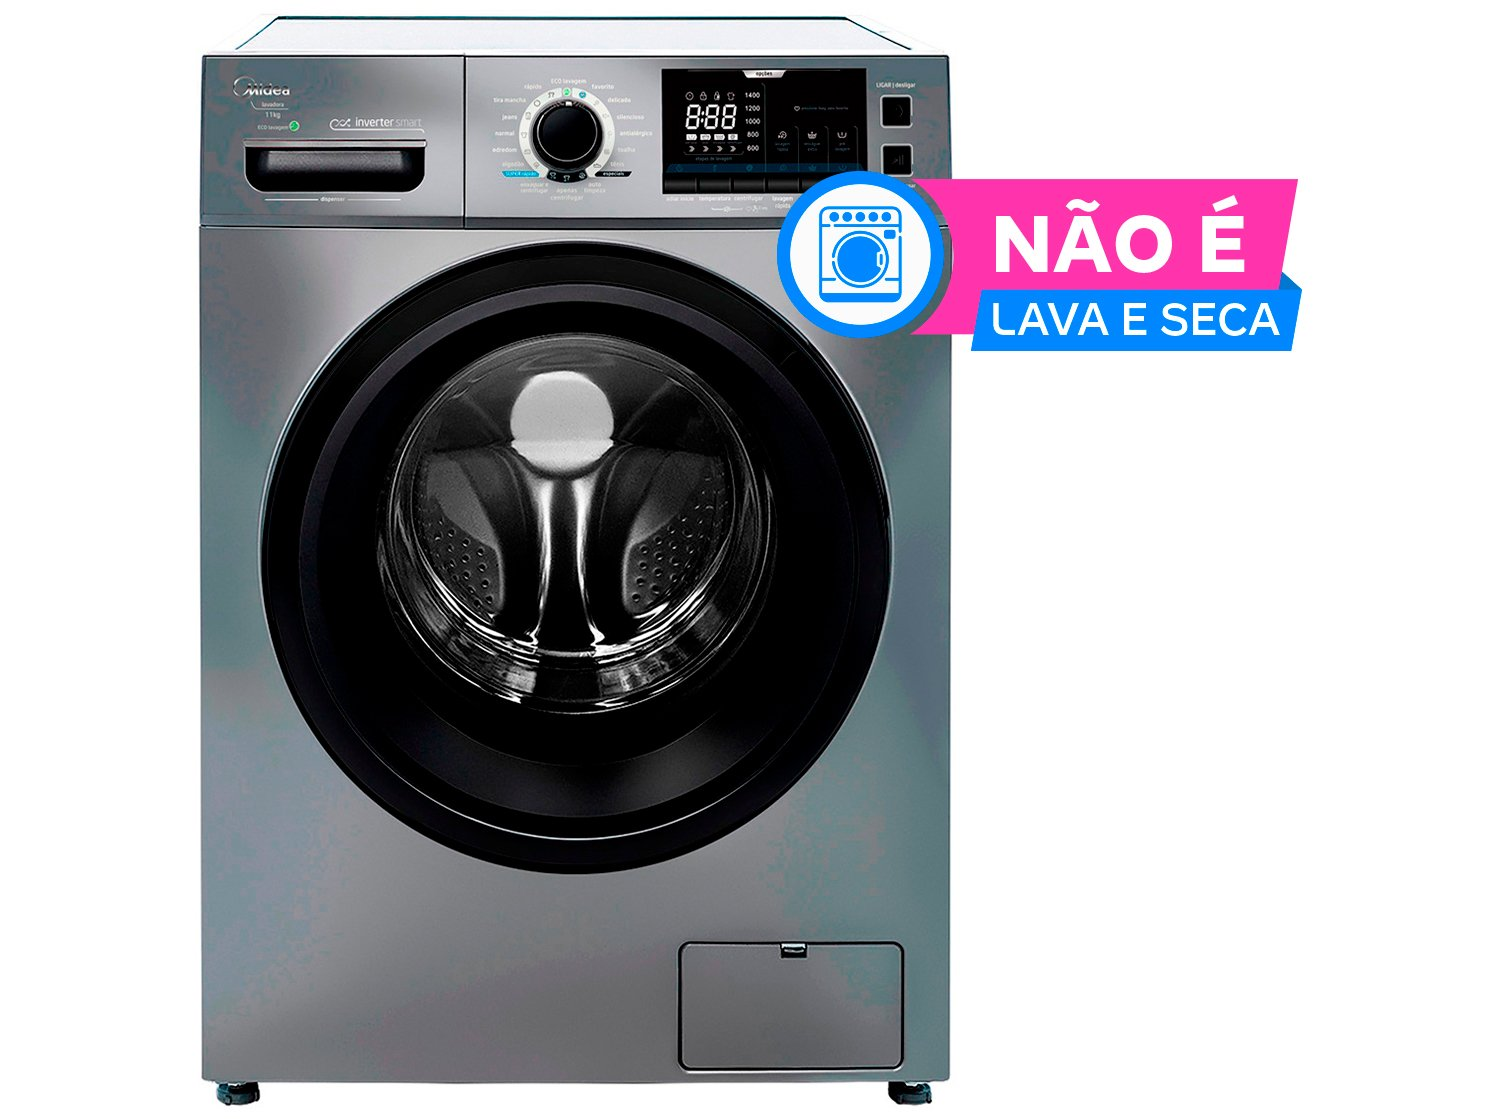 Lavadora de Roupas Midea Storm Wash LFA11X1 - Inverter 11kg Cesto Inox 16 Programas de Lavagem - 110 V - 1